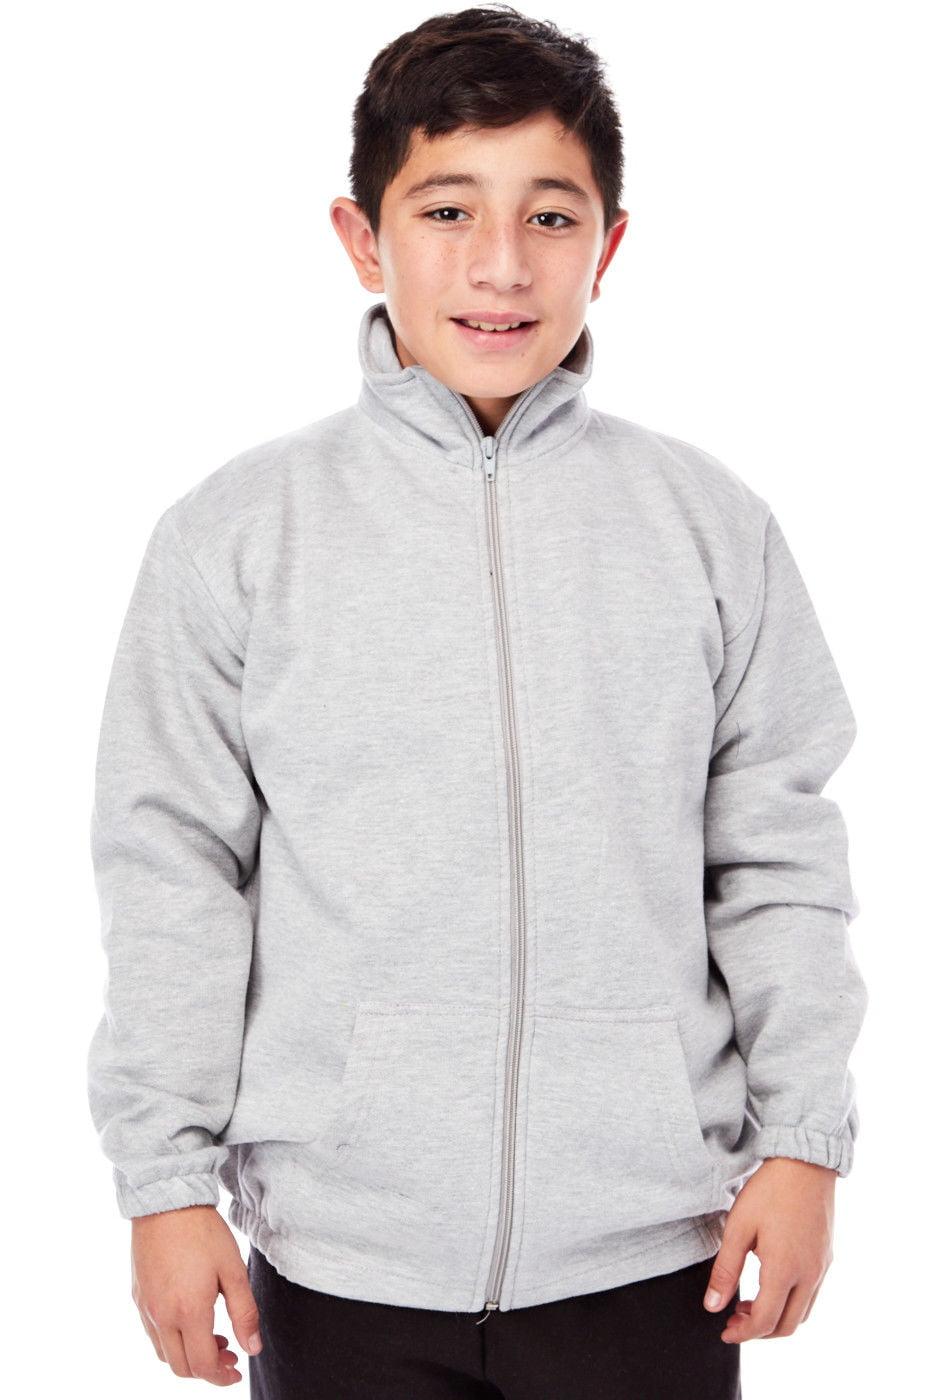 Boys Kids Mock Neck Fleece Zip Up Sweater Jacket 102 (XXS(3-4), Grey)